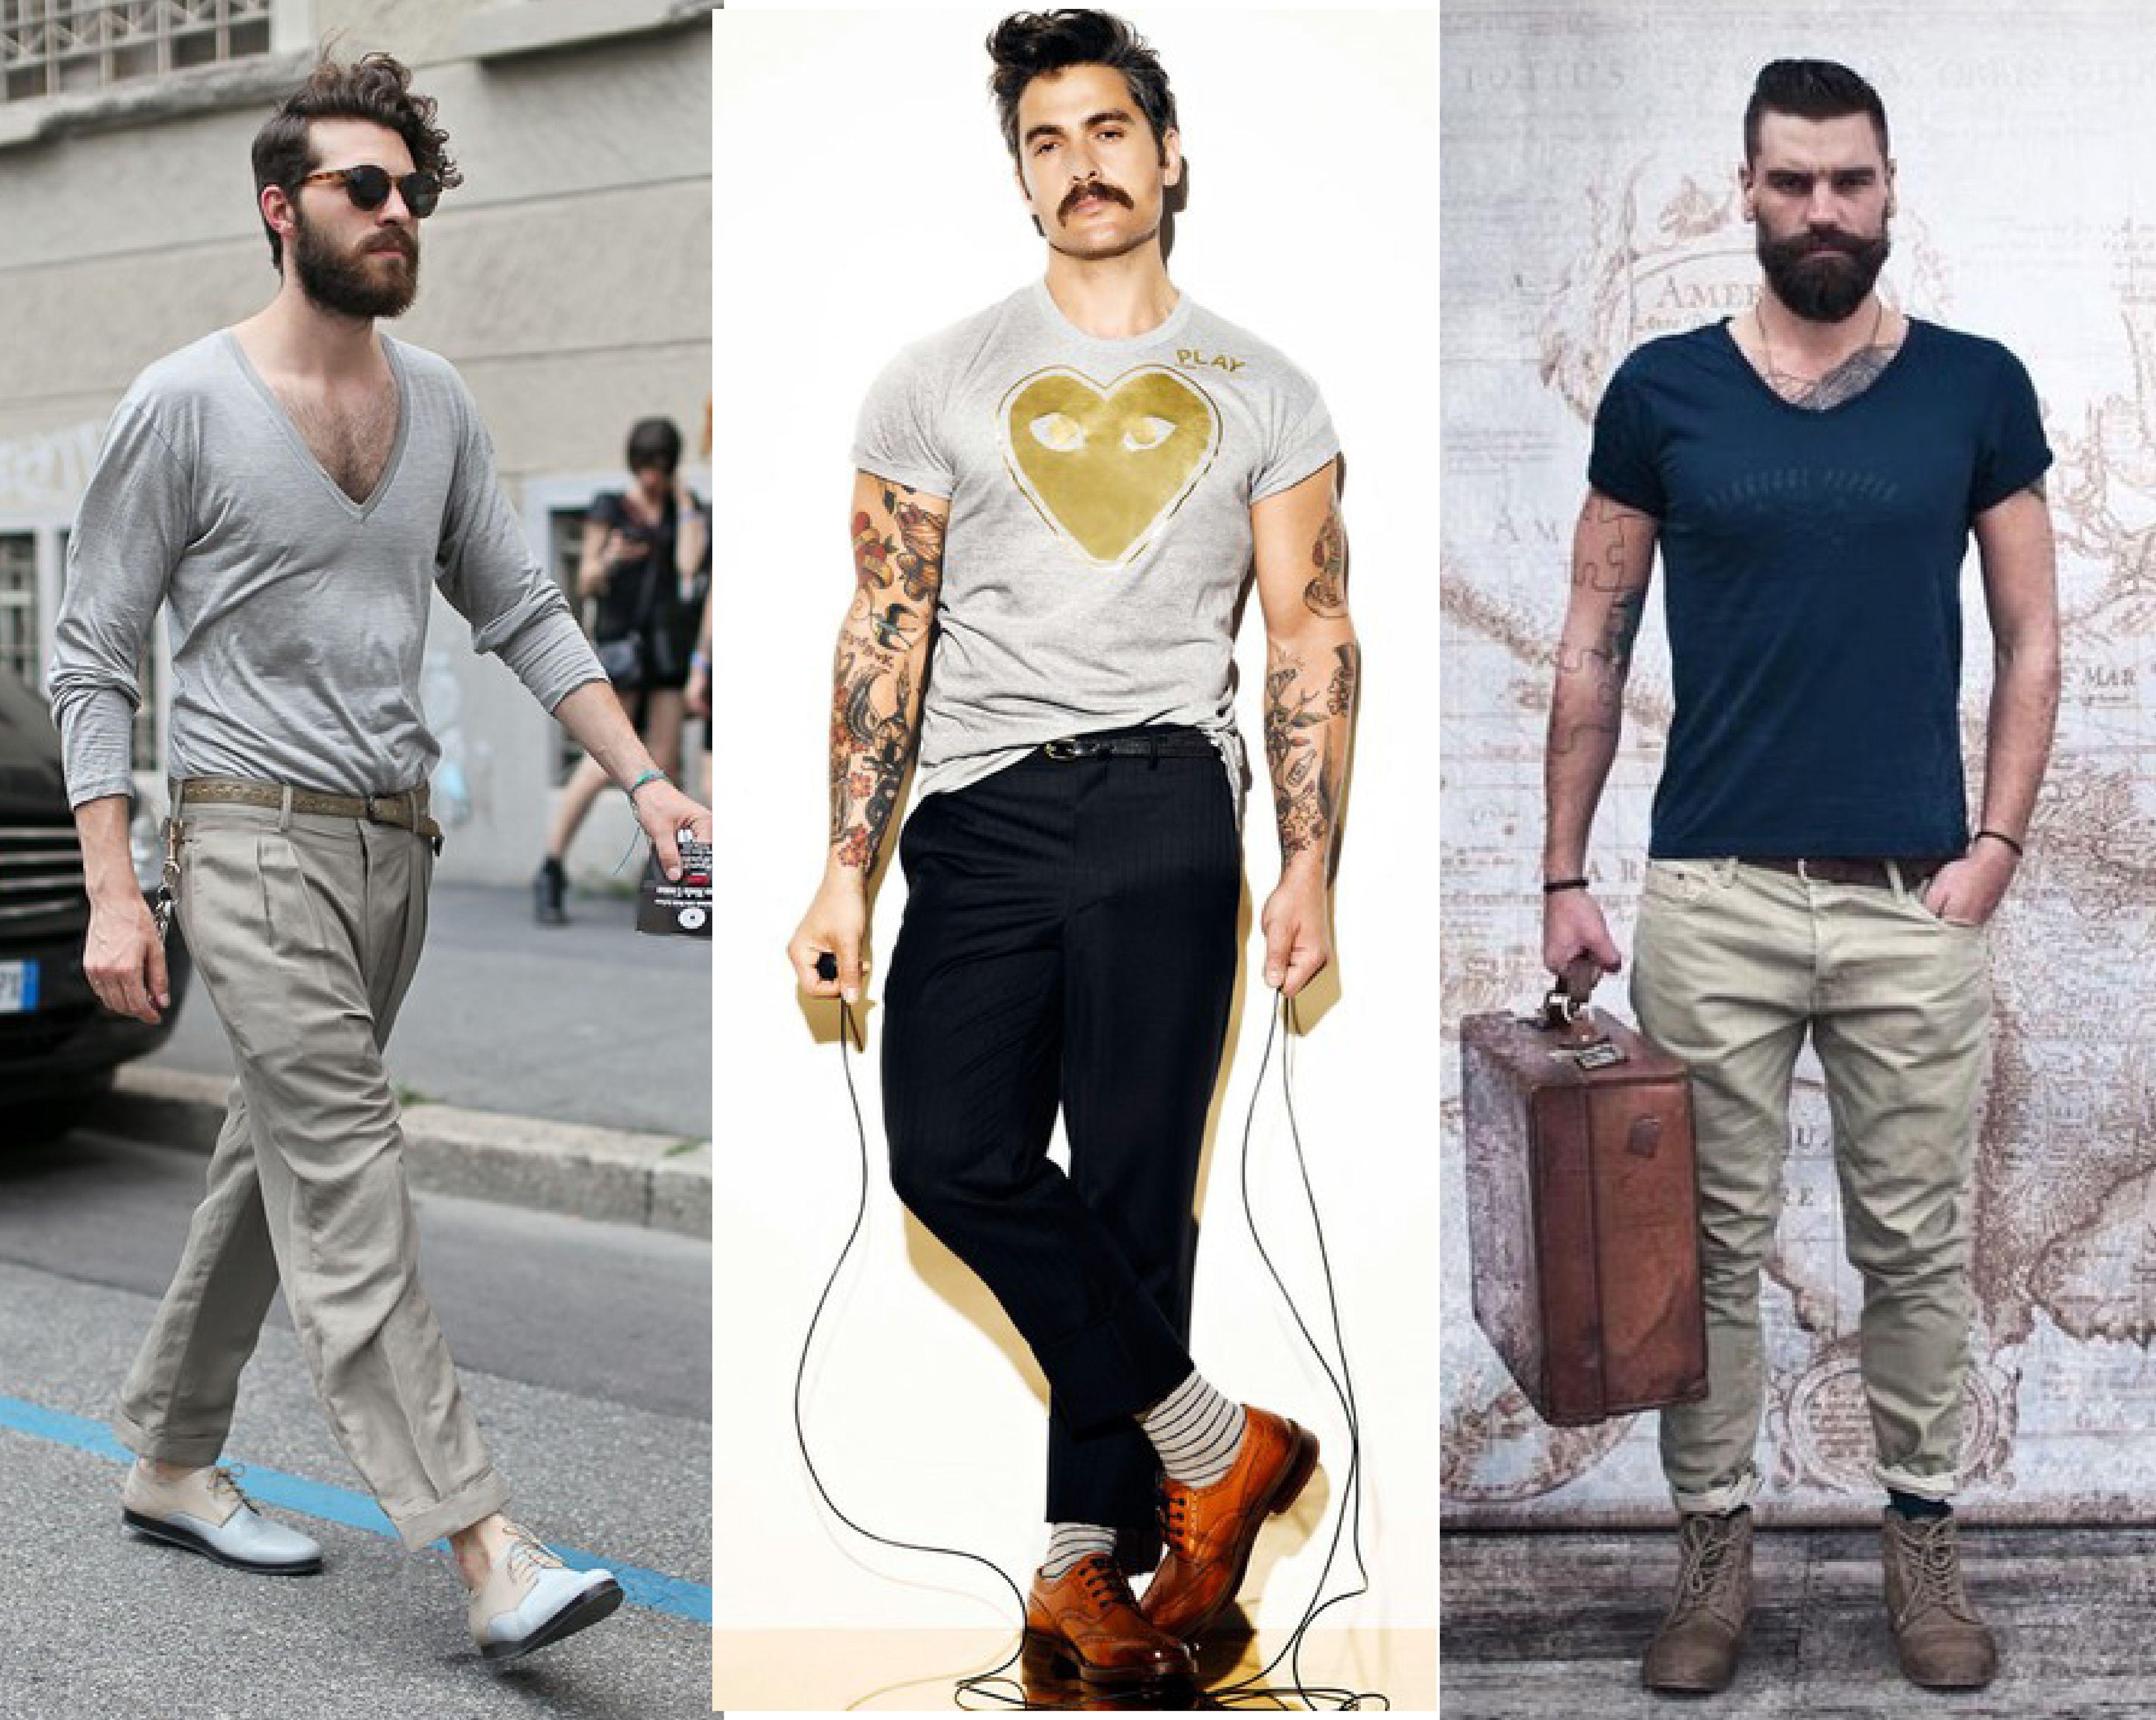 8faa15fc15b96 moda-barba-fashion-beard-hipster-indie-look-estilo -style-modaddiction-johnny-harrington-hombre-man-menswear-trends-tendencias- chic-elegante-casual-elegancia ...